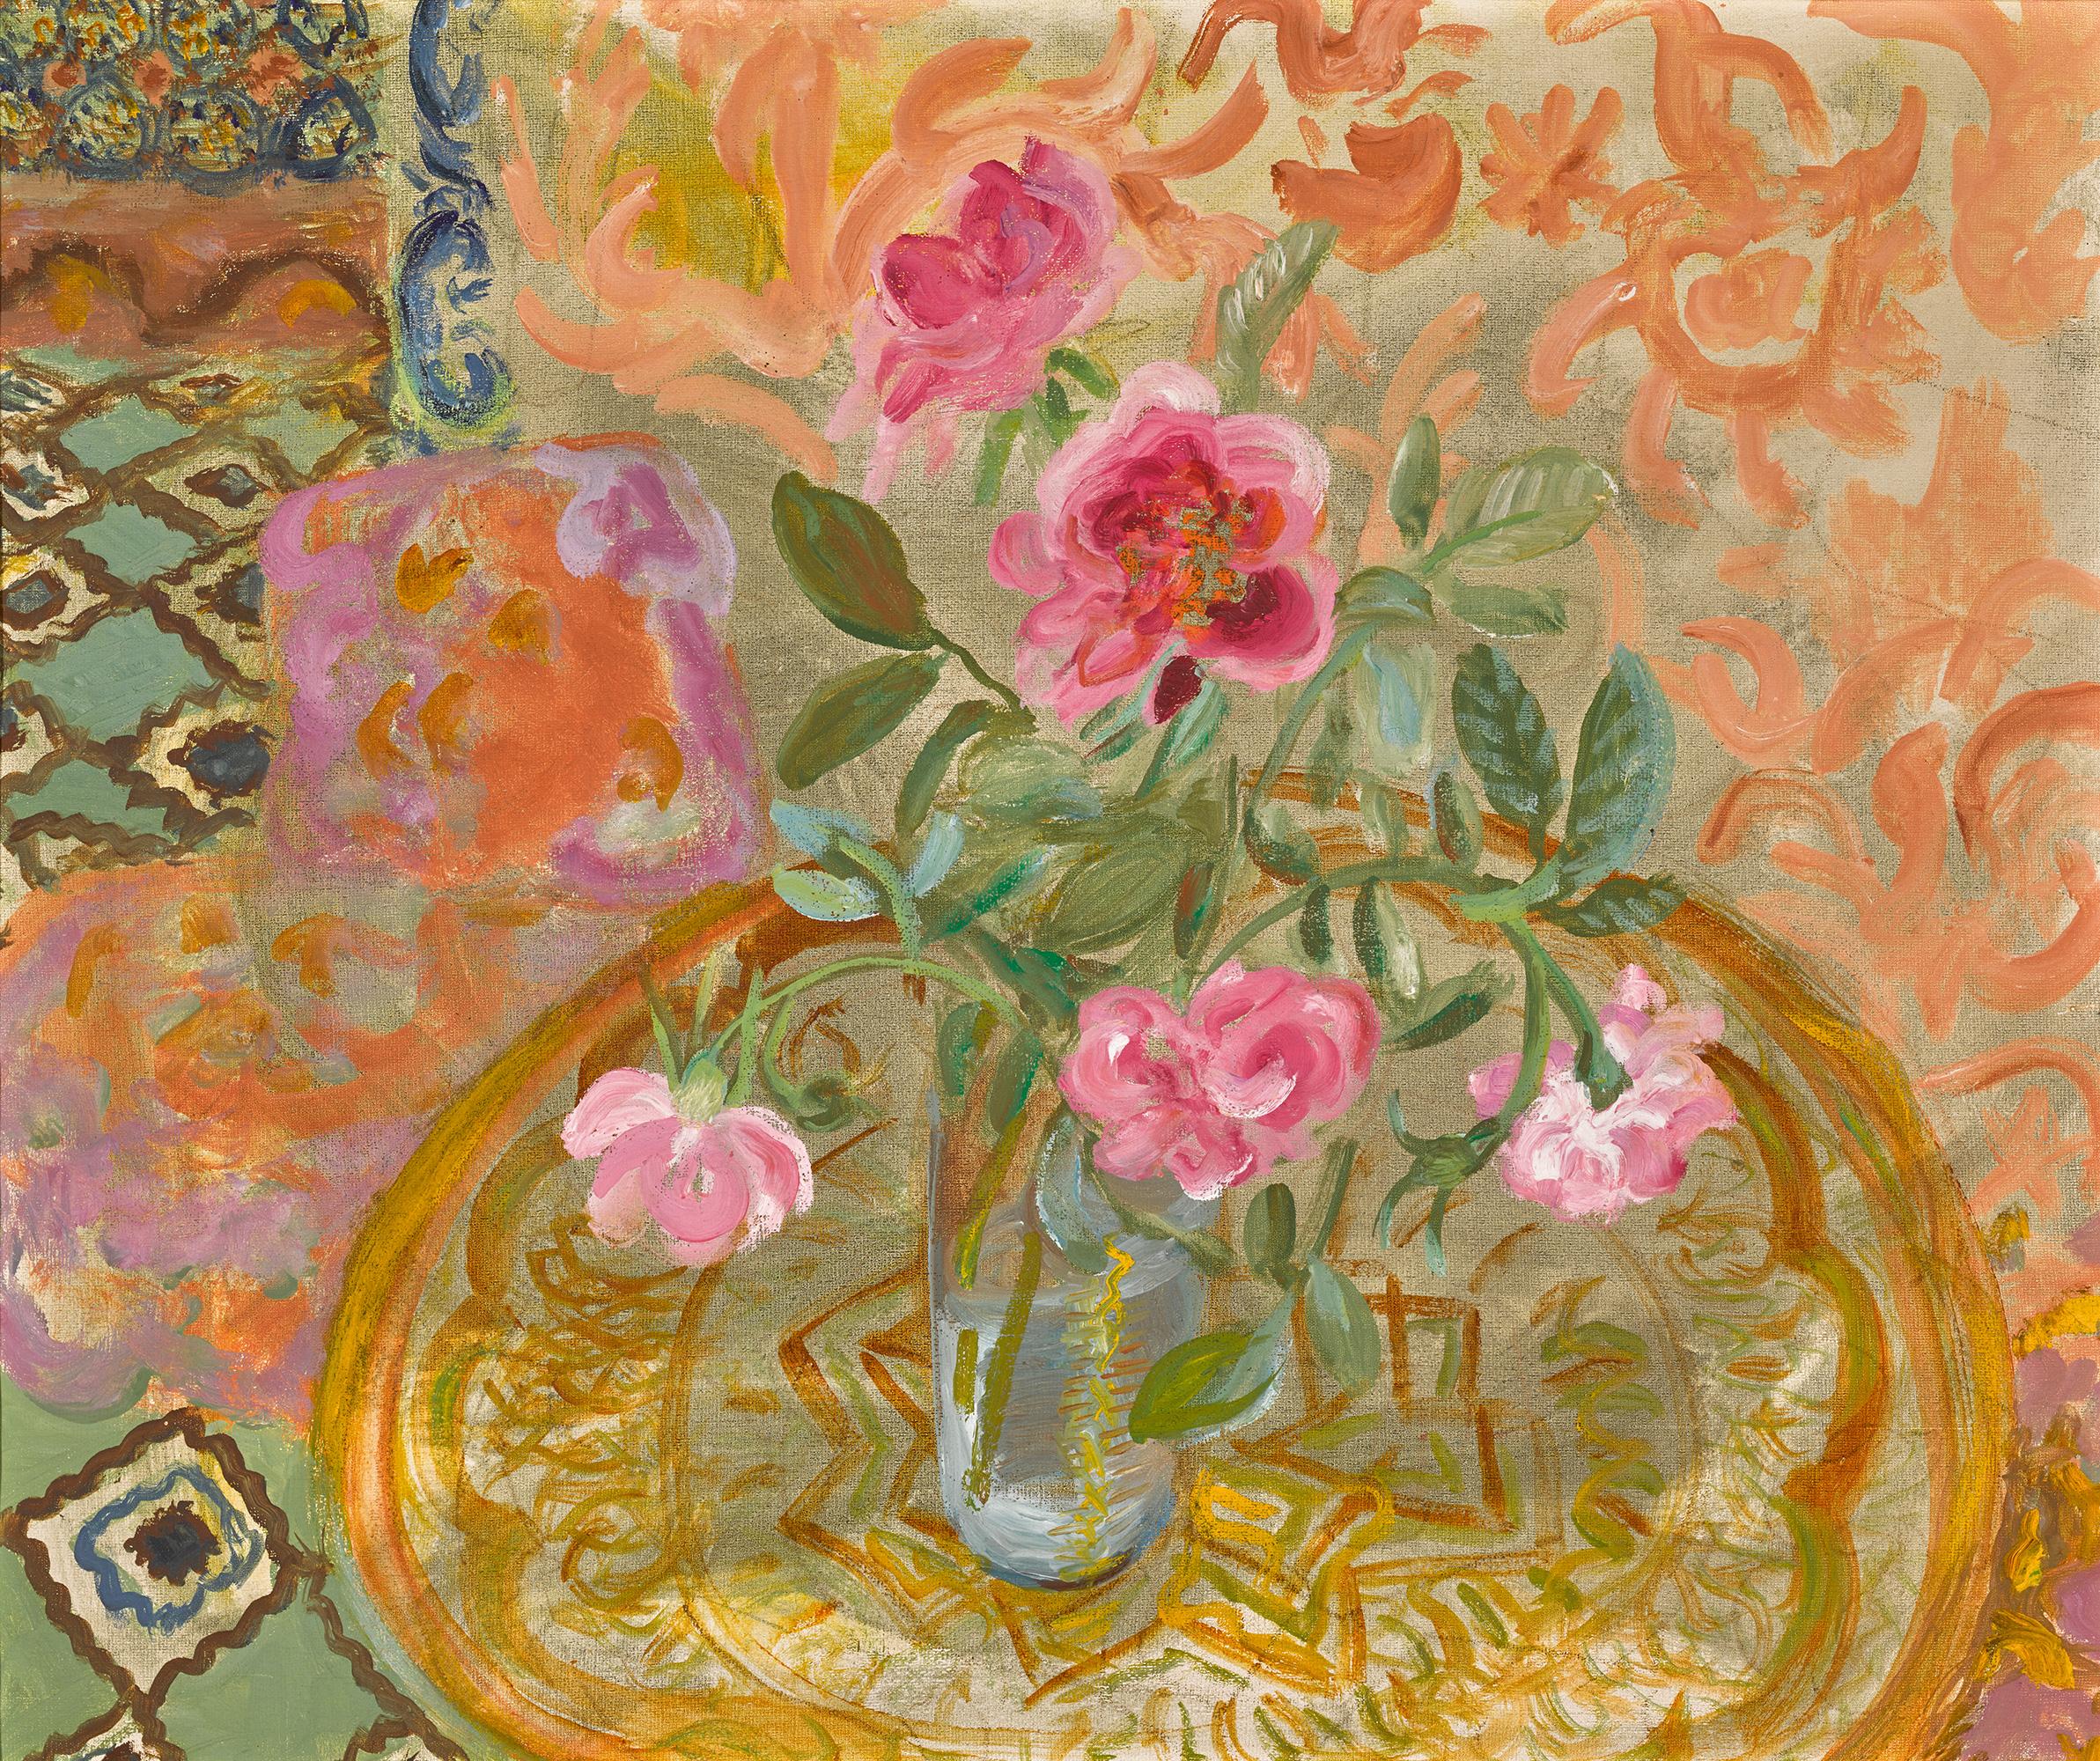 Winifred Nicolson,  Arab Roses,  1971